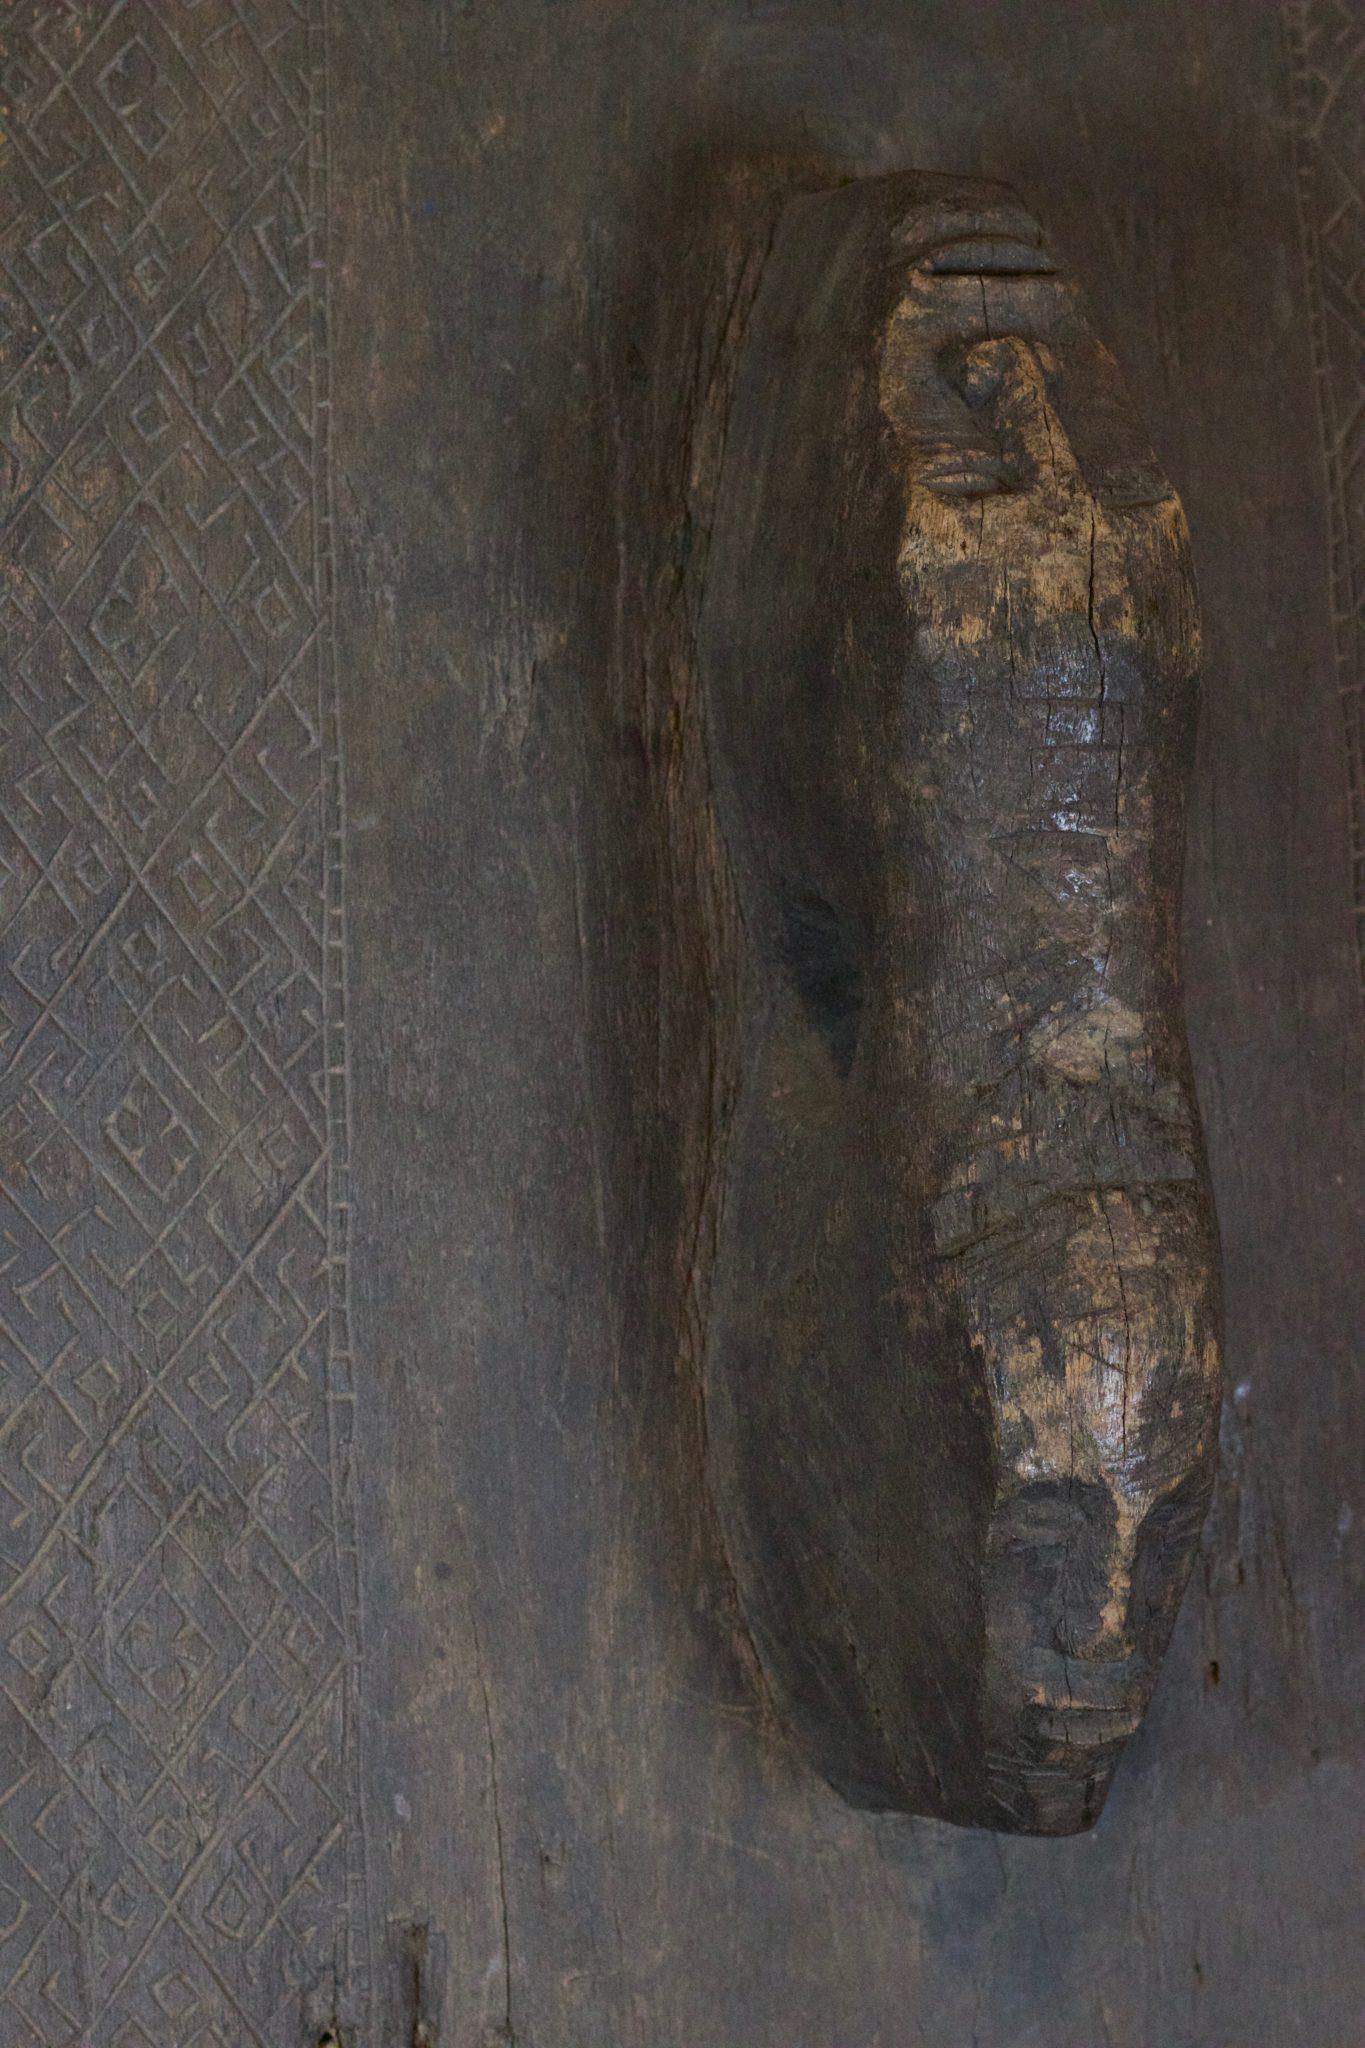 Handle Detail of Shaman Ritual Spirit Door (see previous image)